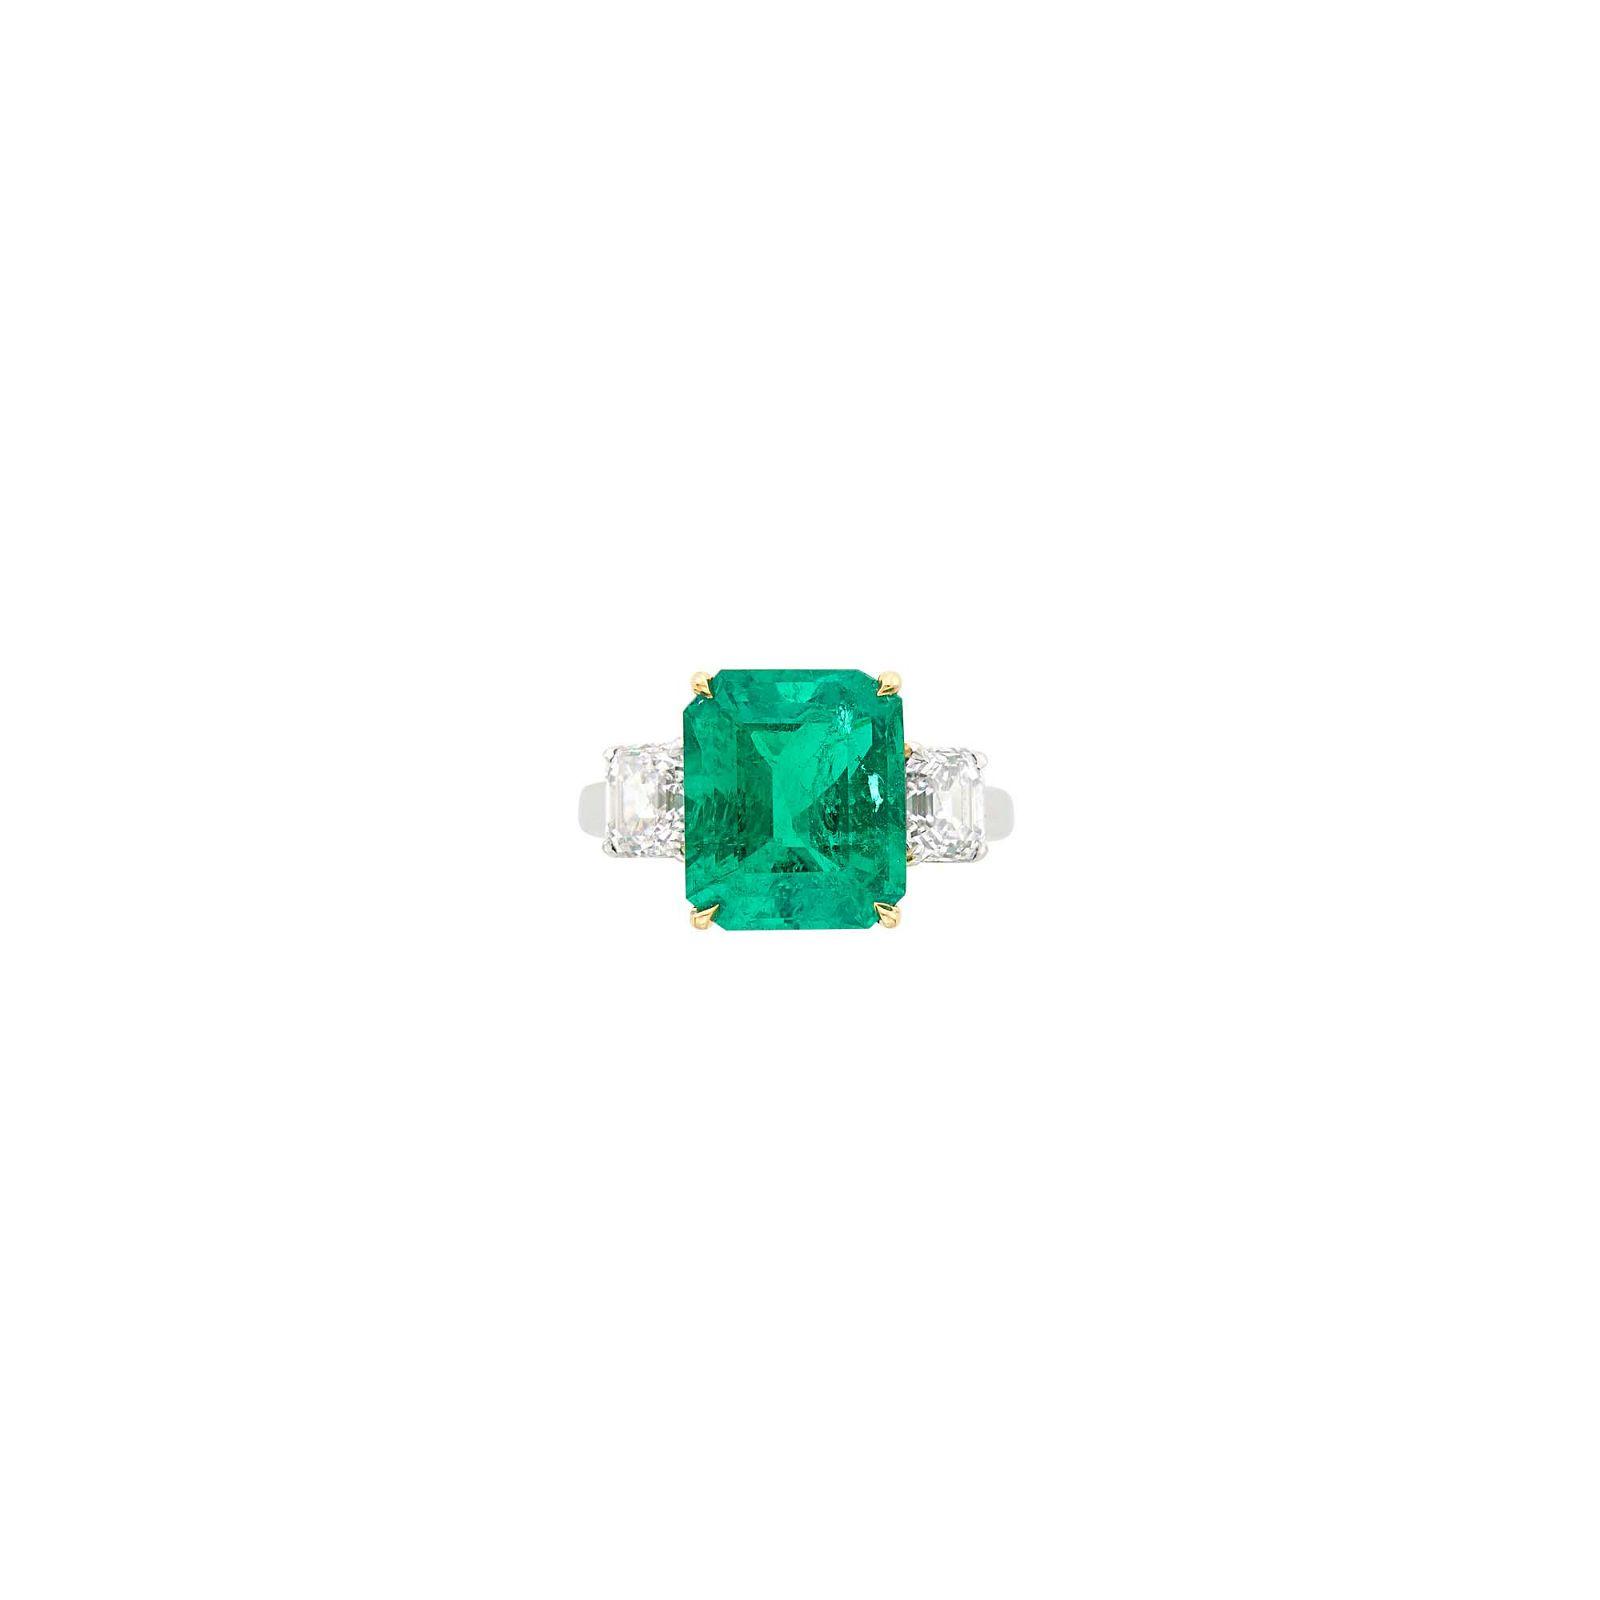 Harry Winston Platinum, Gold, Emerald and Diamond Ring